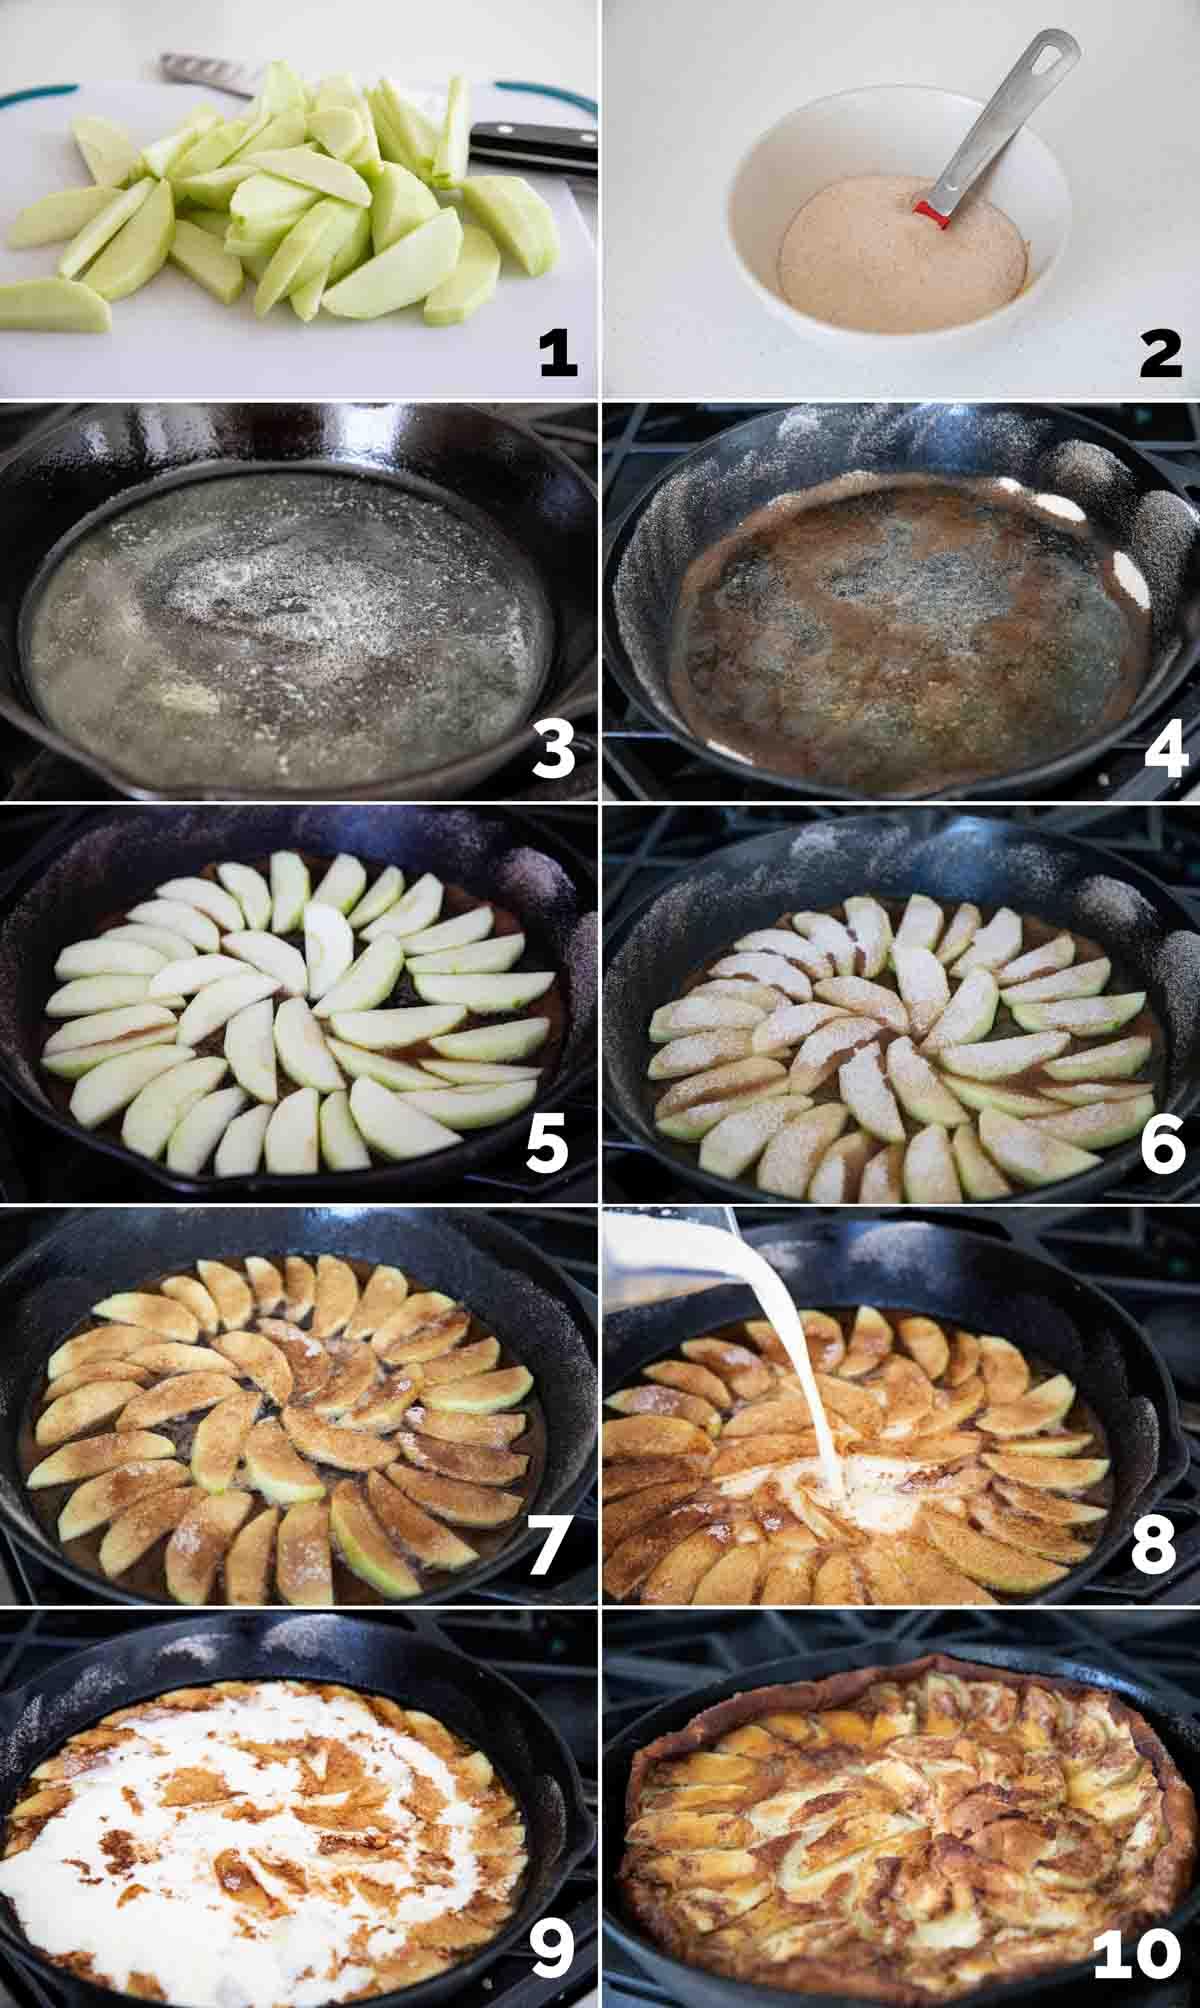 steps to make a German apple pancake